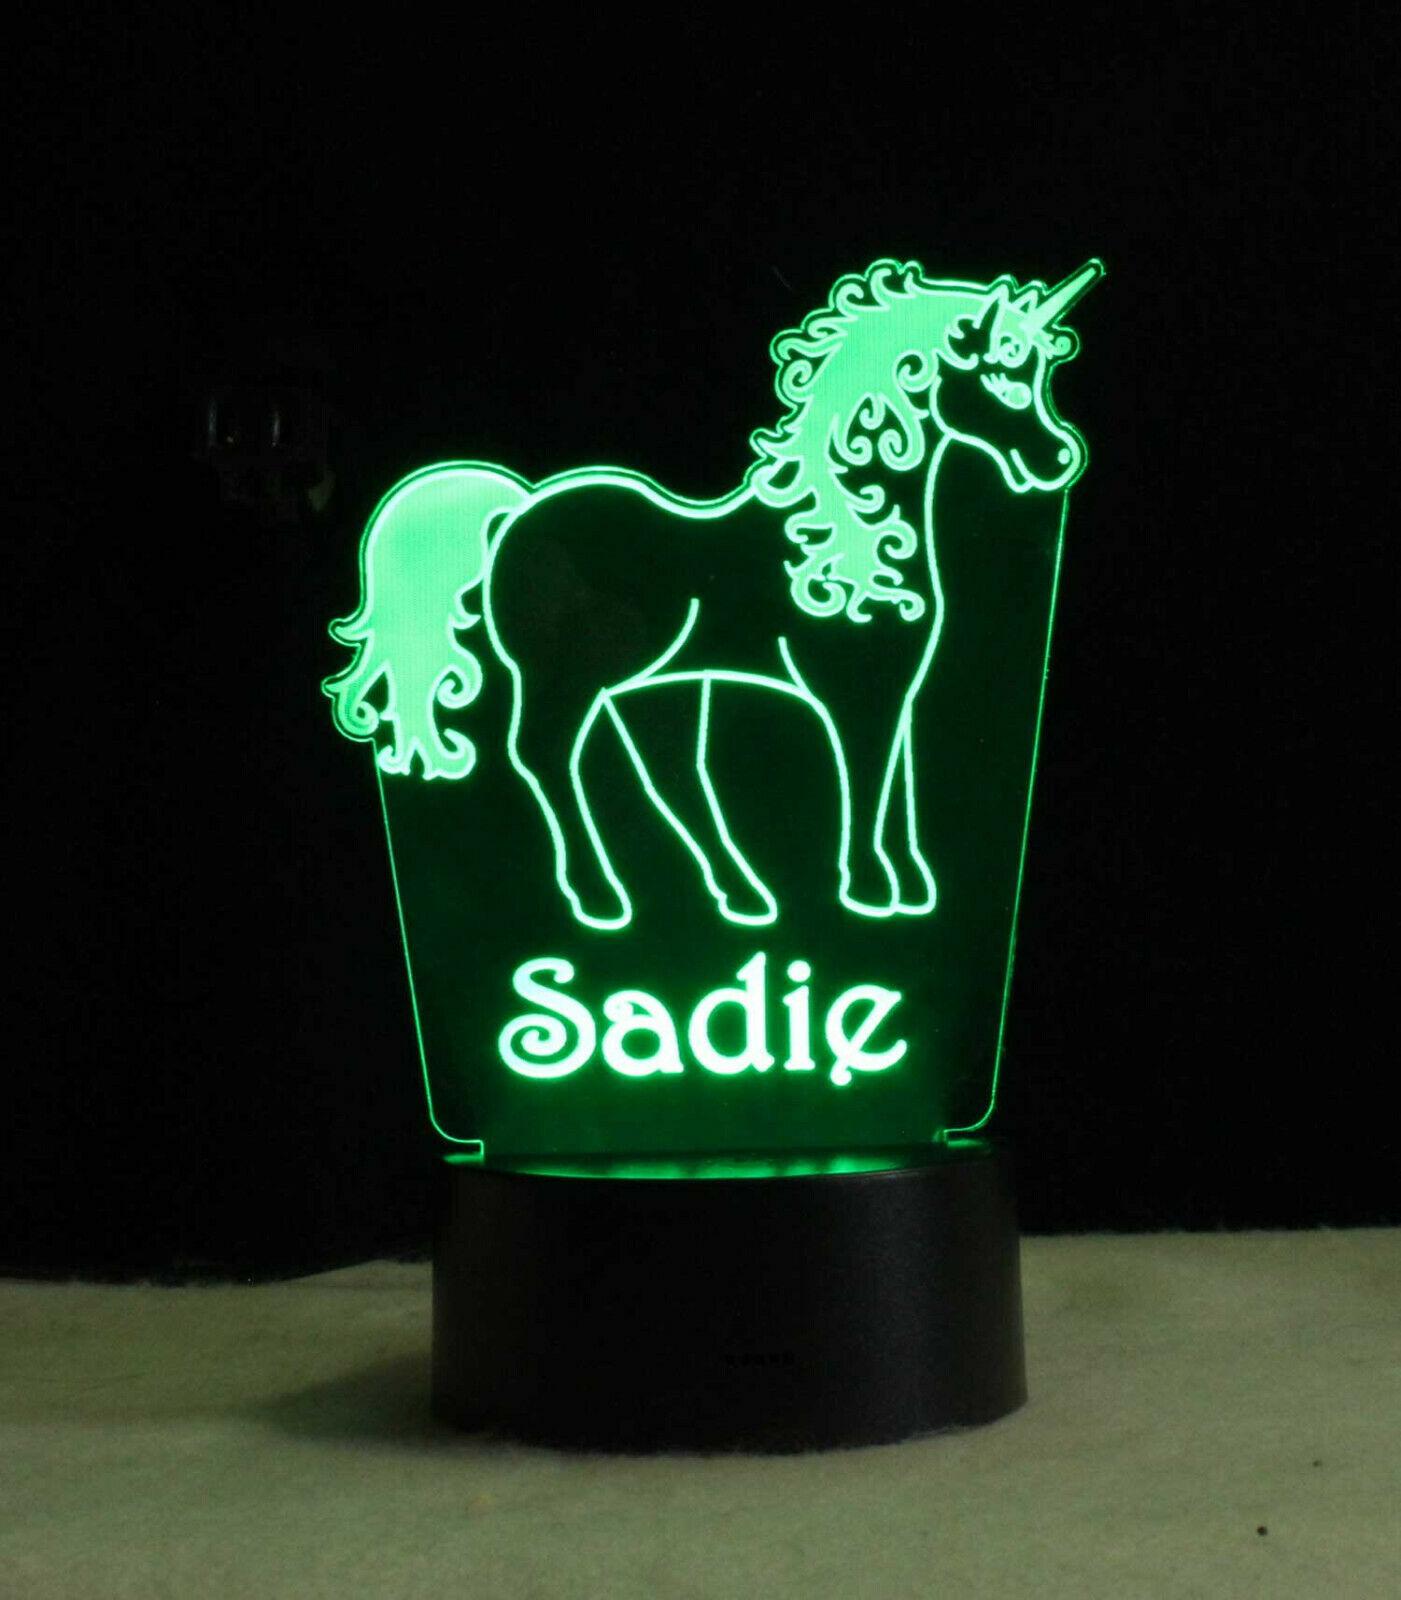 Personalized Unicorn Lamp Night light USB or Wall Plug In image 3